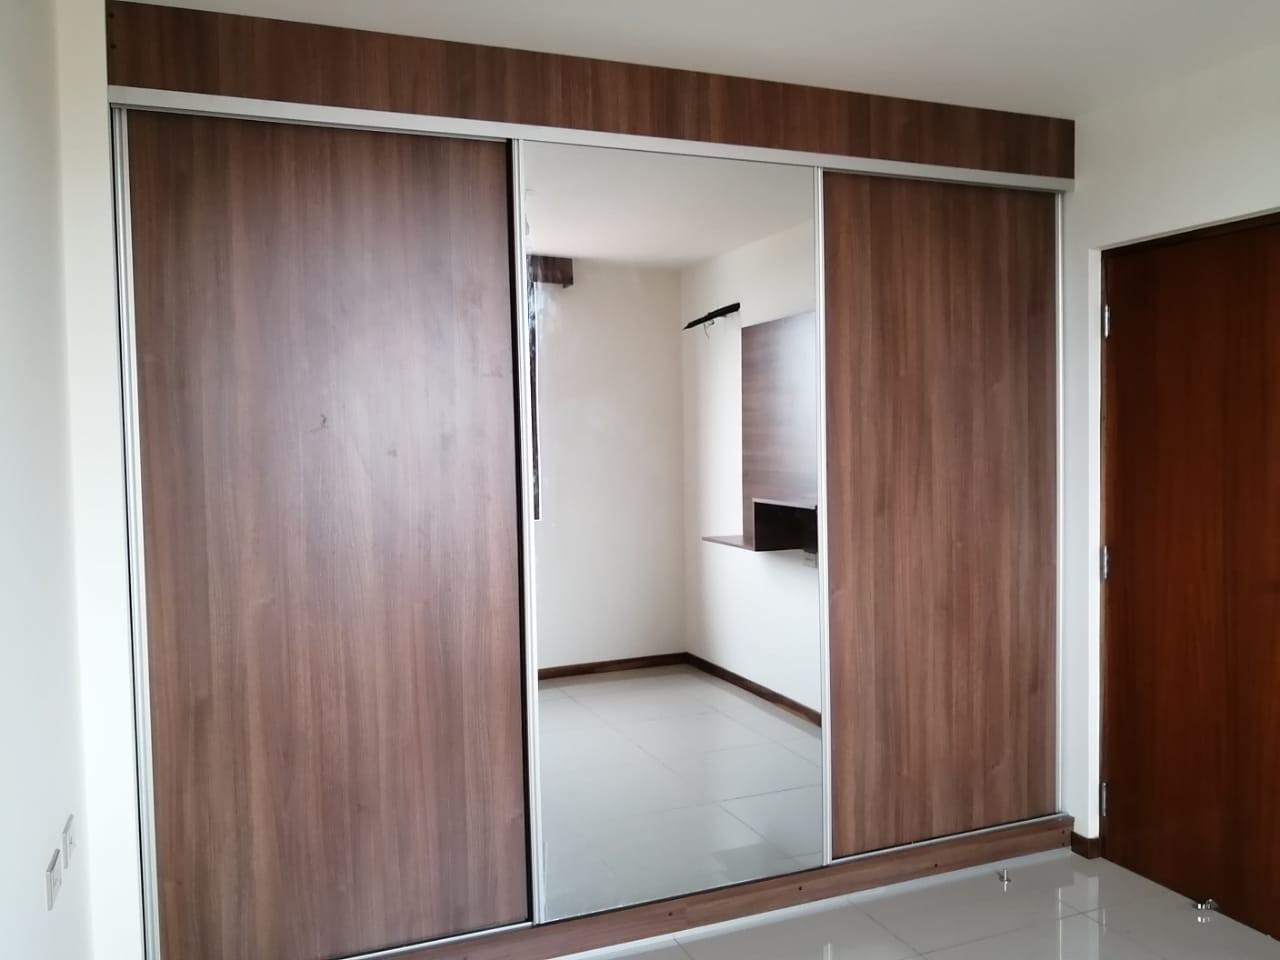 Departamento en Alquiler Edif. Macororó 11 - A Estrenar Dpto. 1 Dorm. Foto 7